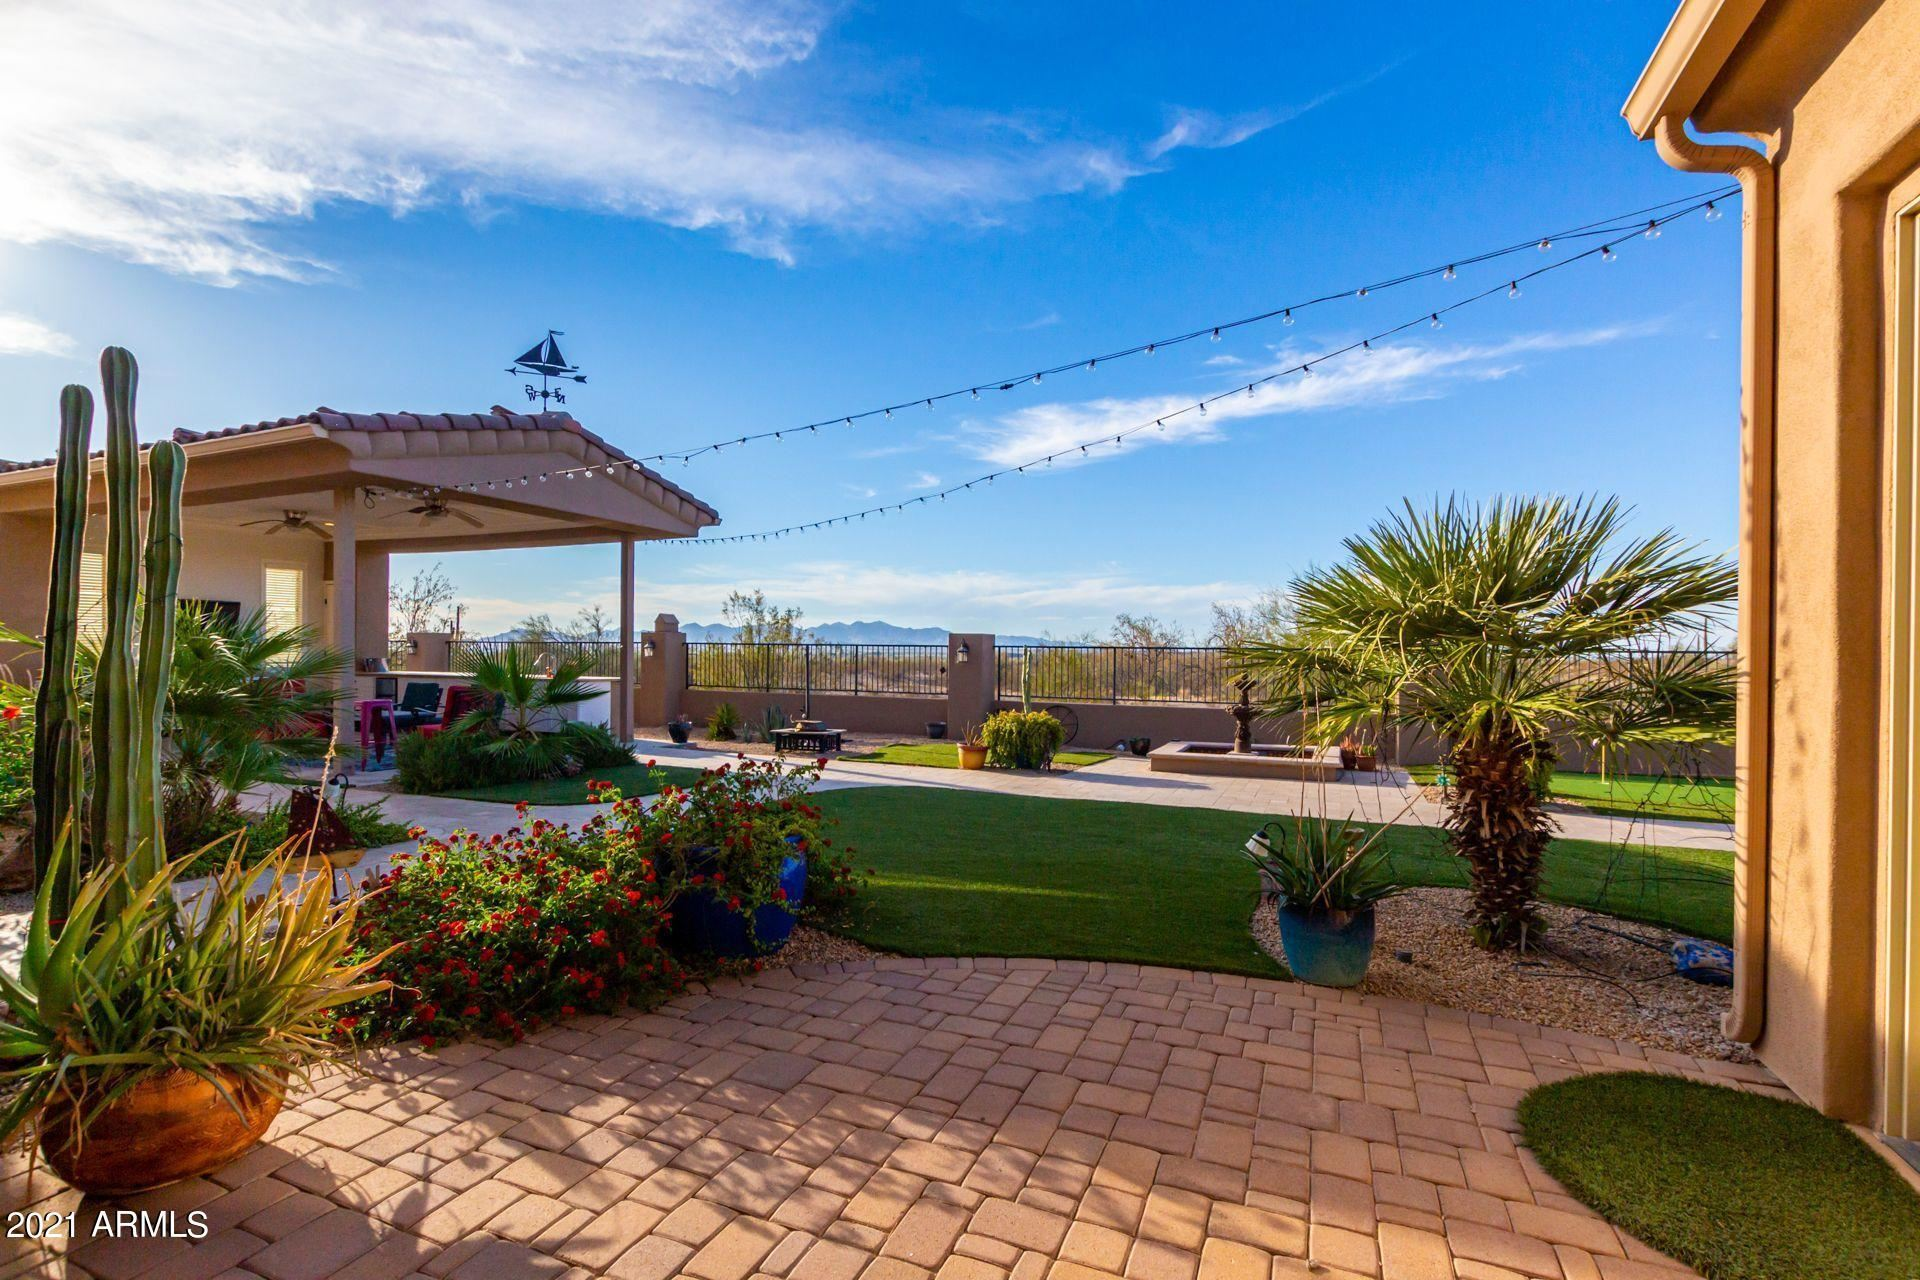 Photo of 17672 W PASEO Way, Goodyear, AZ 85338 (MLS # 6248304)